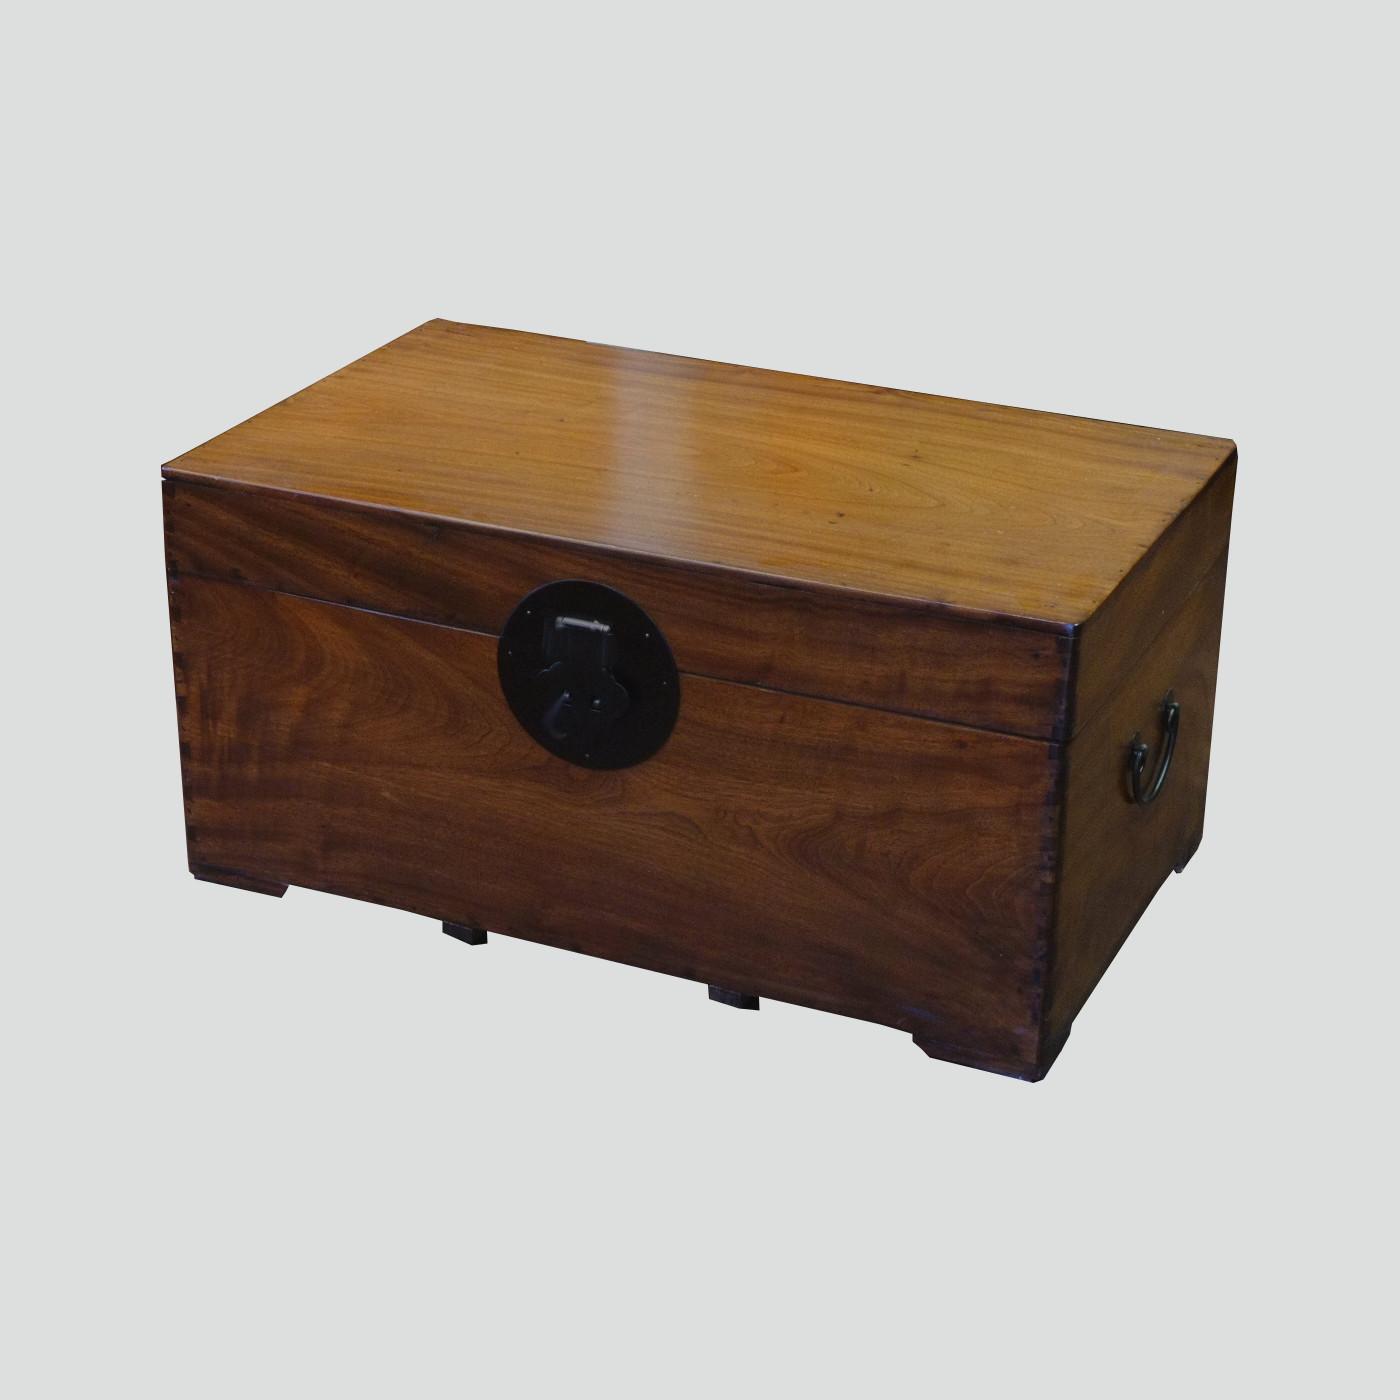 alte chinesische truhe batavia. Black Bedroom Furniture Sets. Home Design Ideas